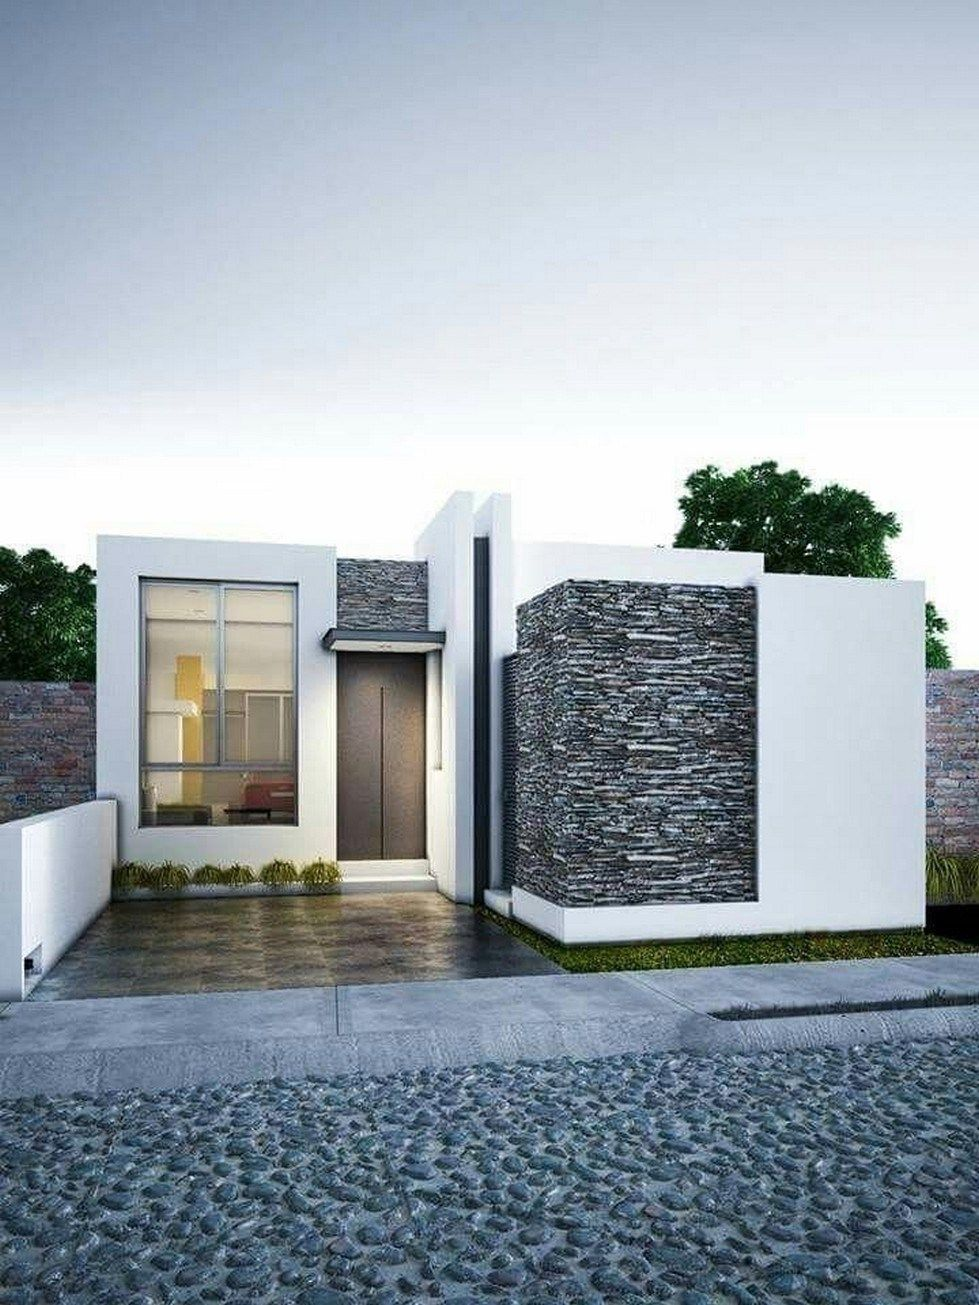 47 Modern Minimalist House Design Ideas For Your 19 Modern